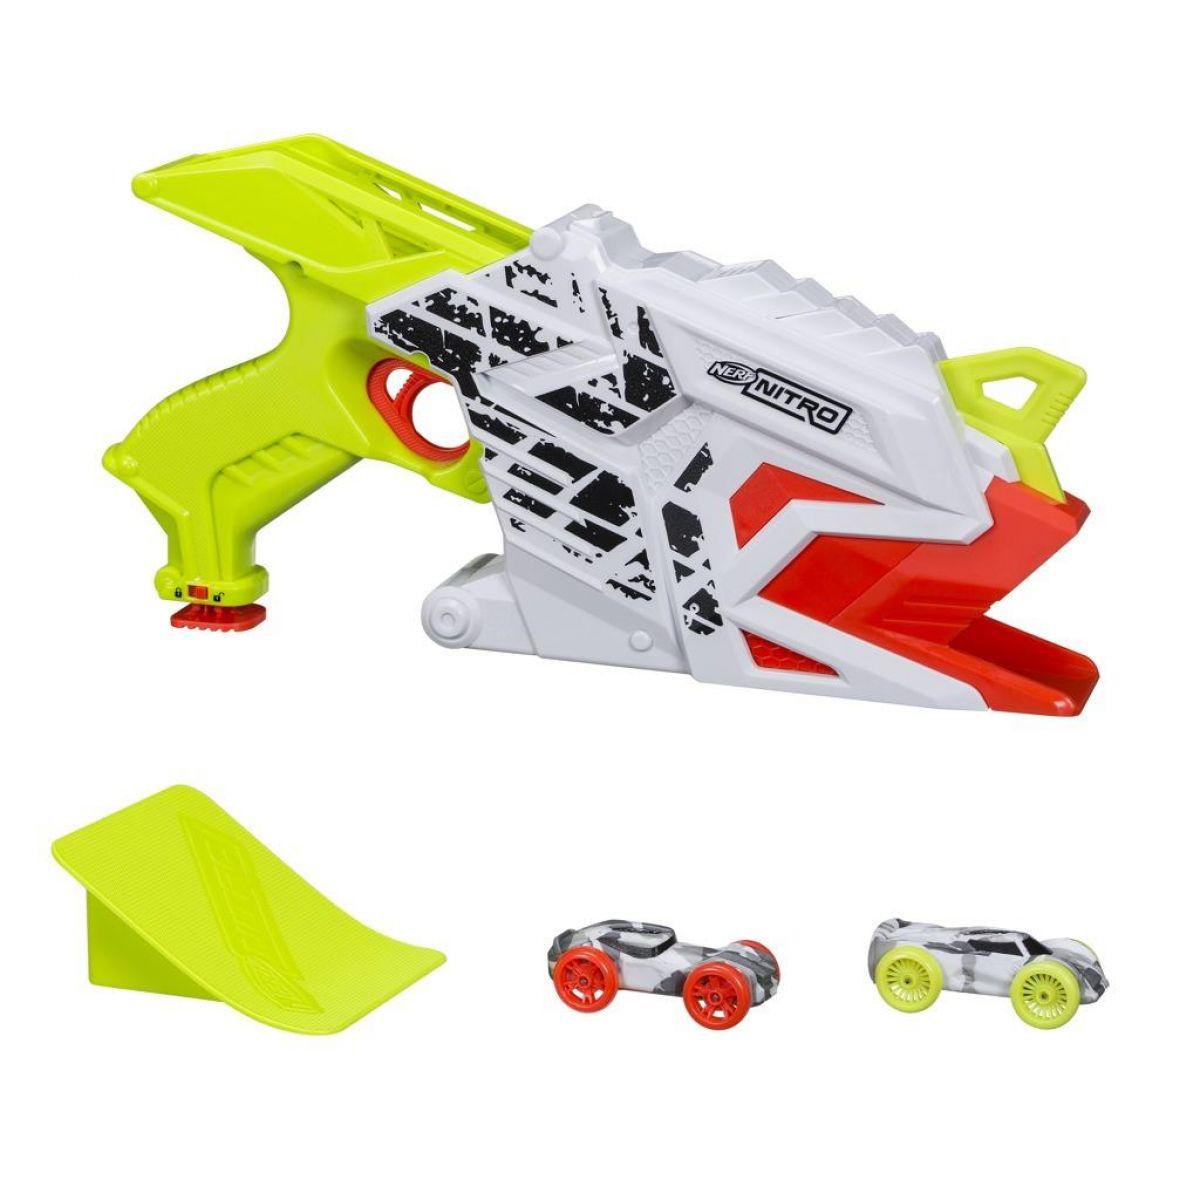 Lamps hračky Nerf Nitro Aerofury